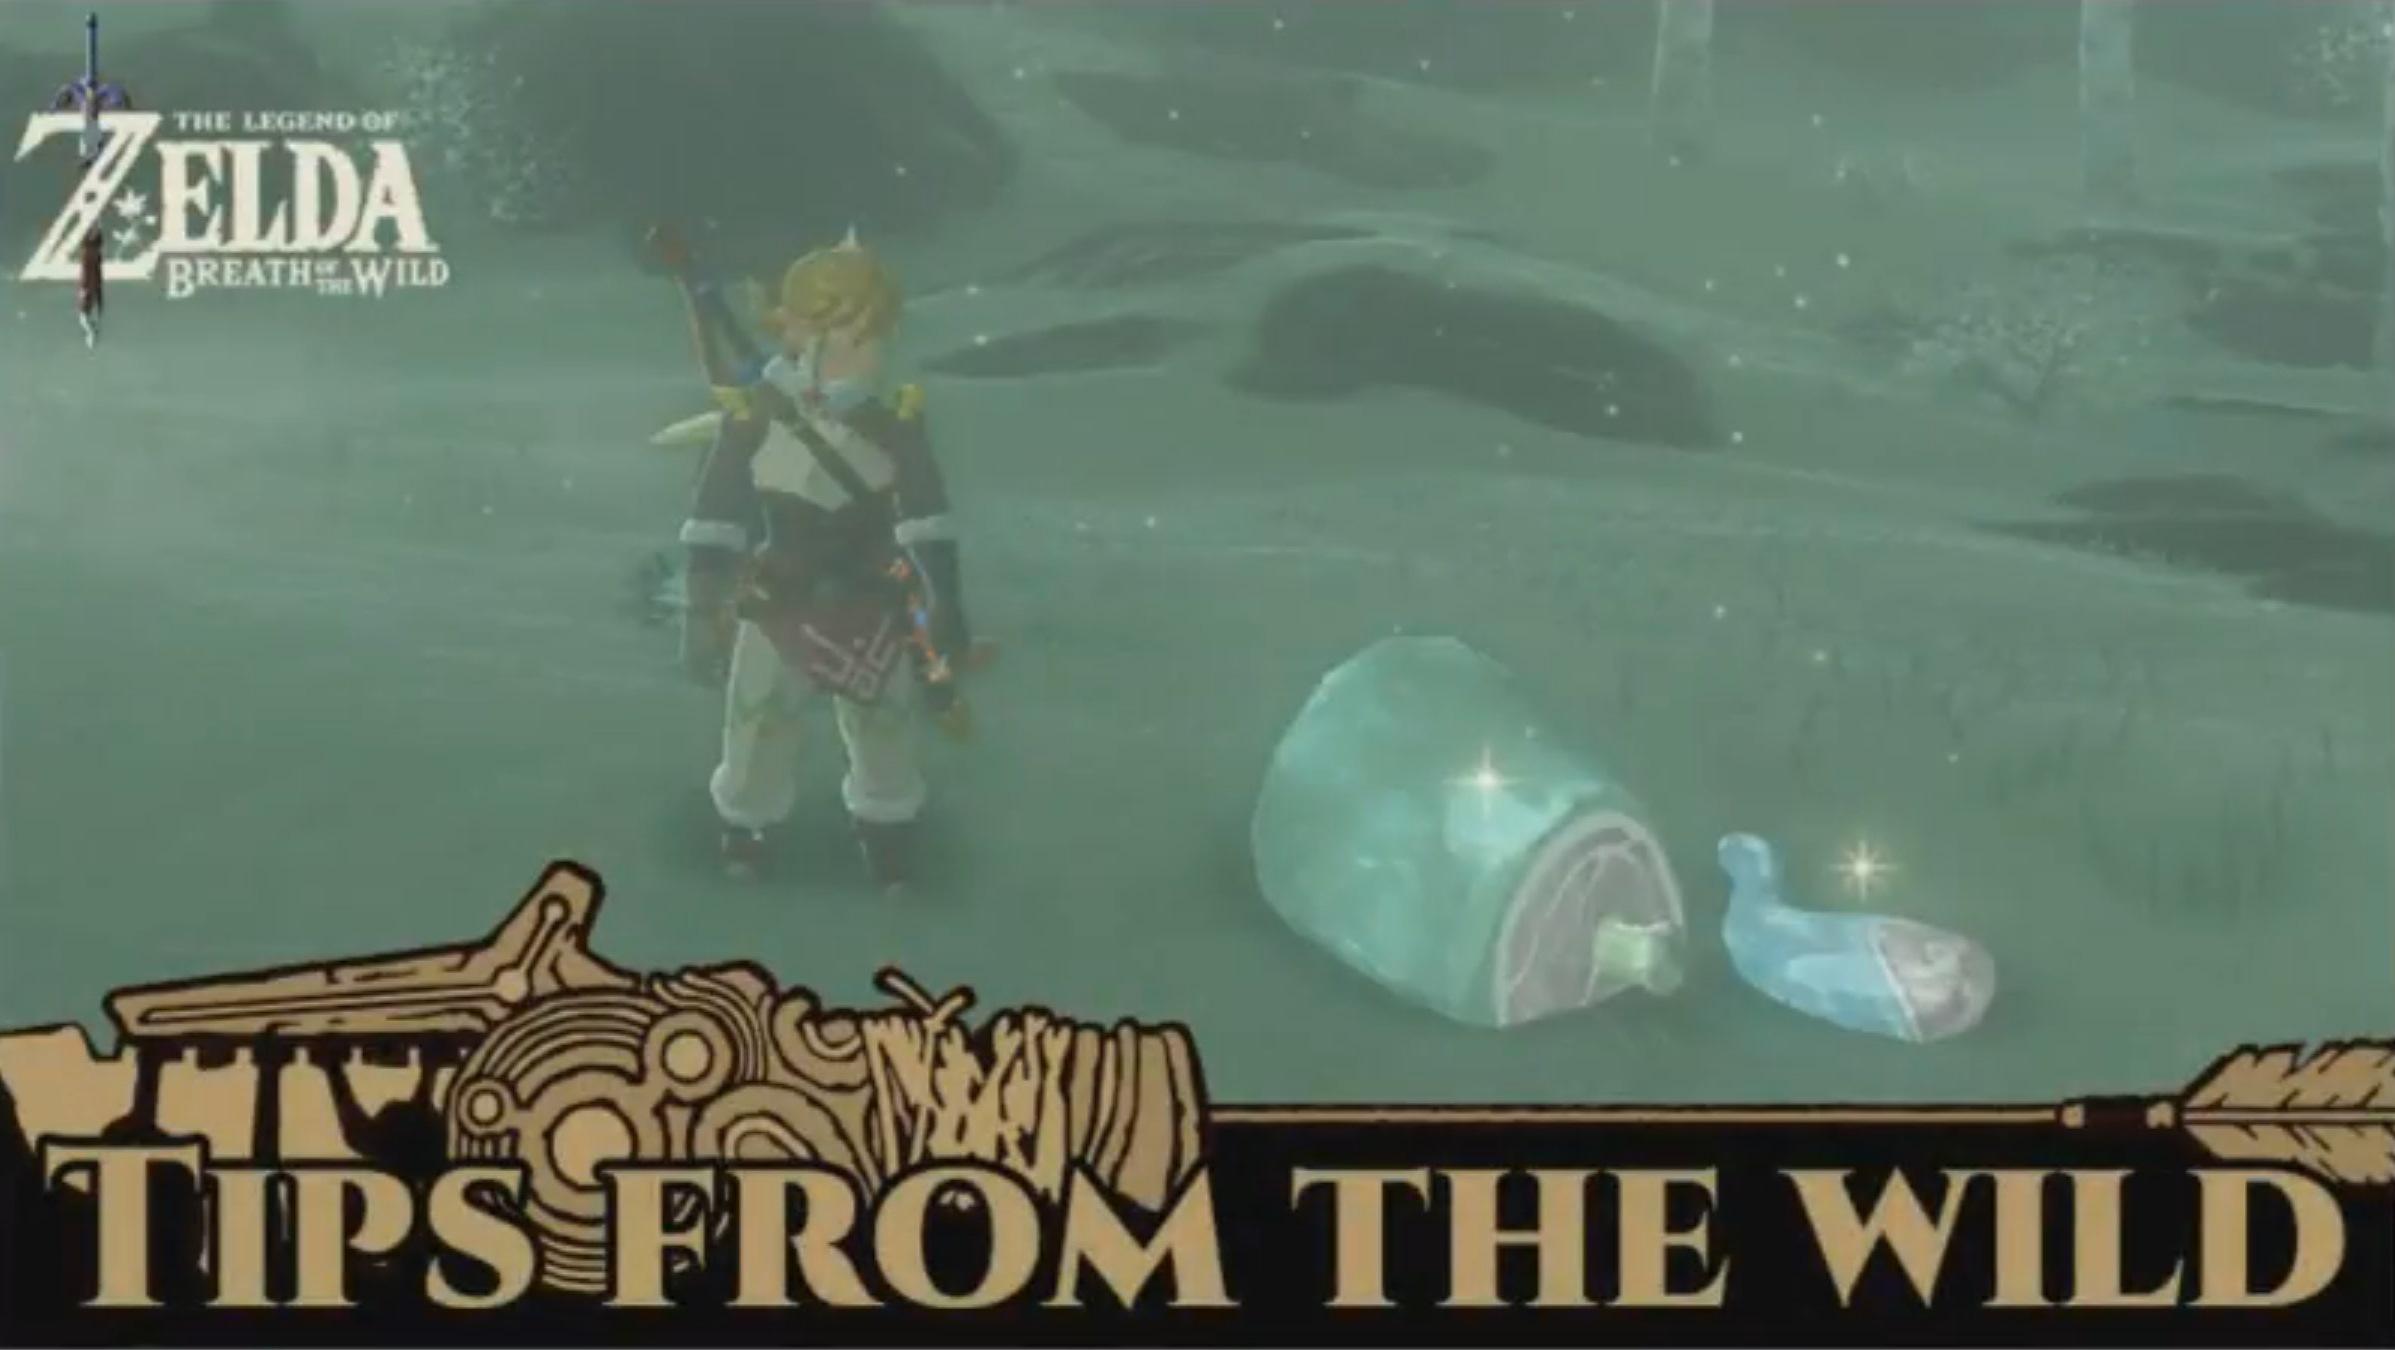 Next Zelda: Breath of the Wild item distribution live on